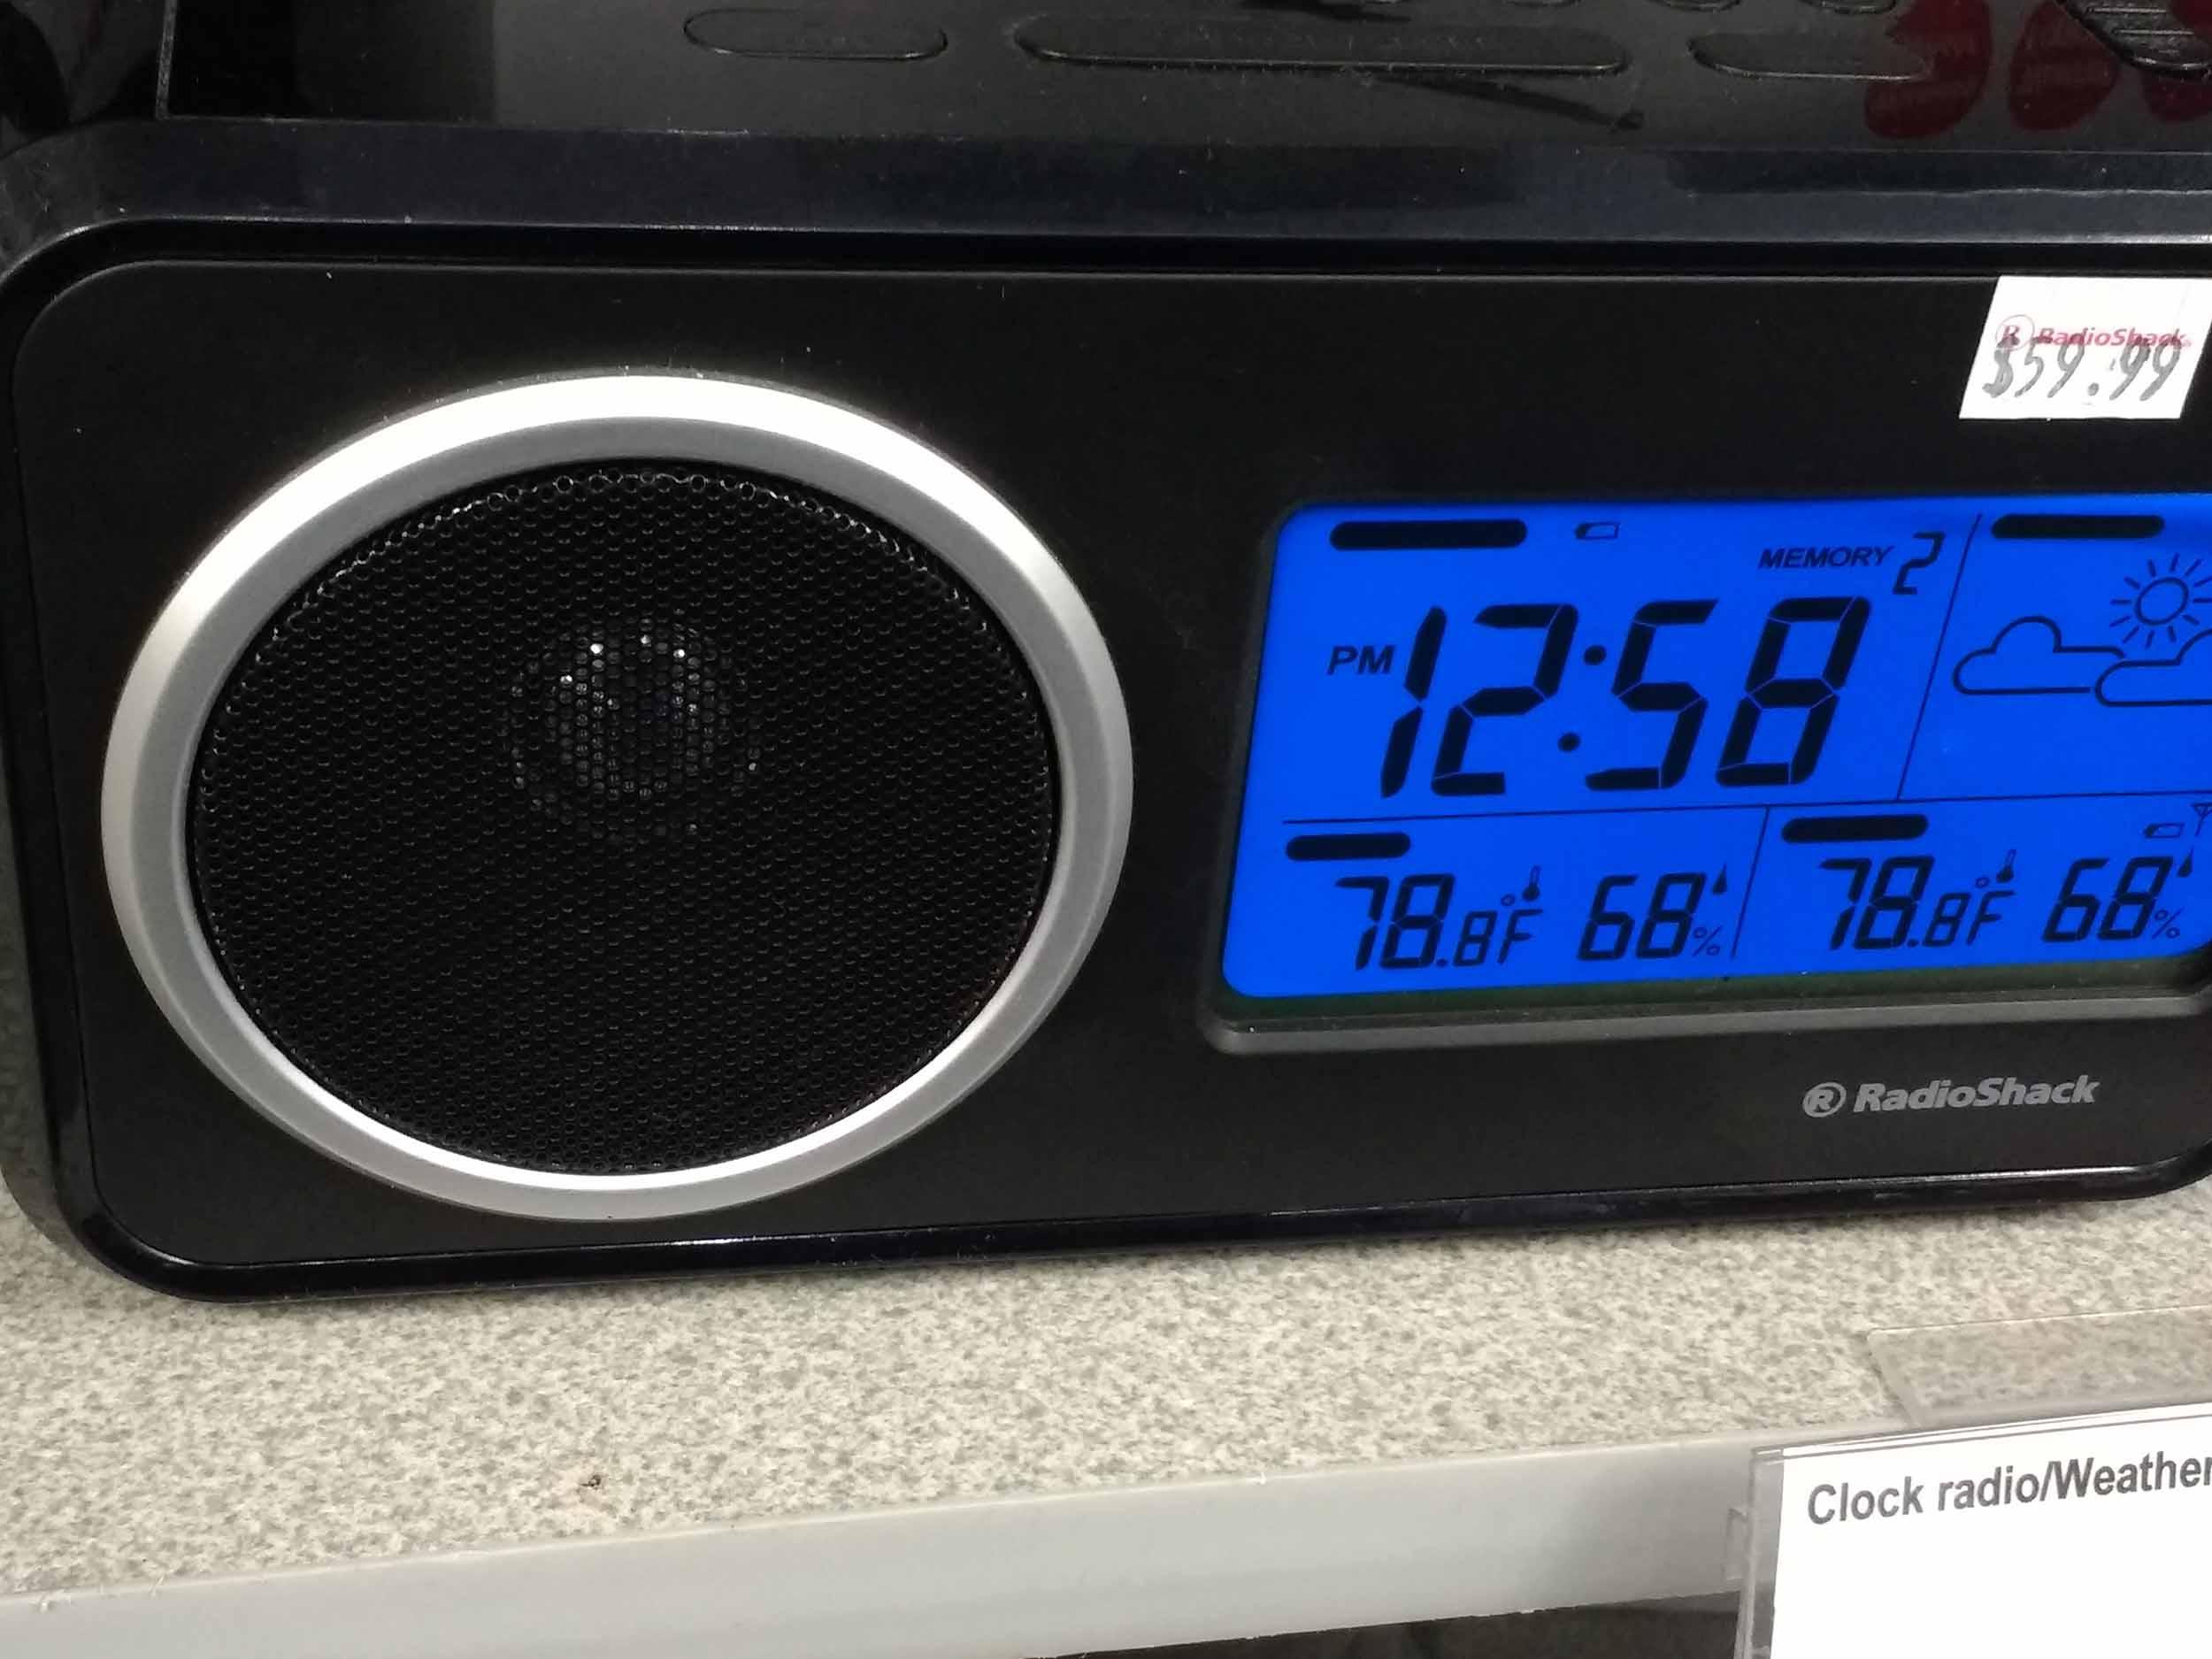 Clock radio with digital weather